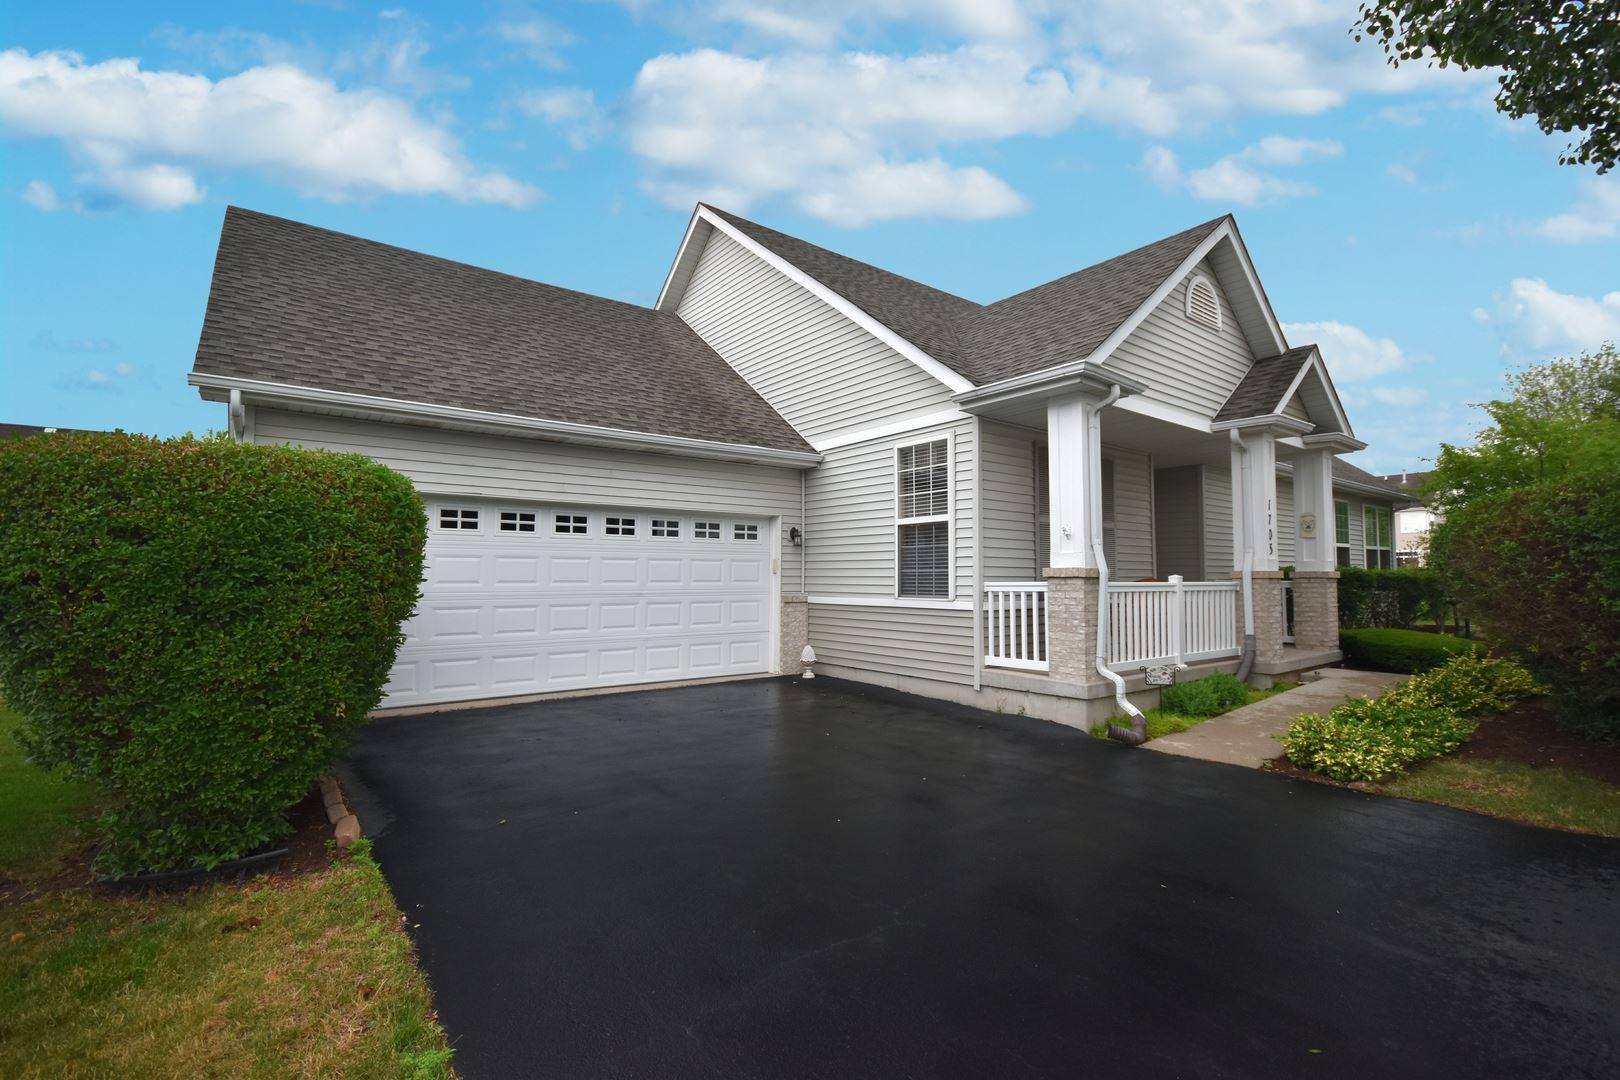 Photo of 1703 Augusta Lane, Shorewood, IL 60404 (MLS # 11153528)